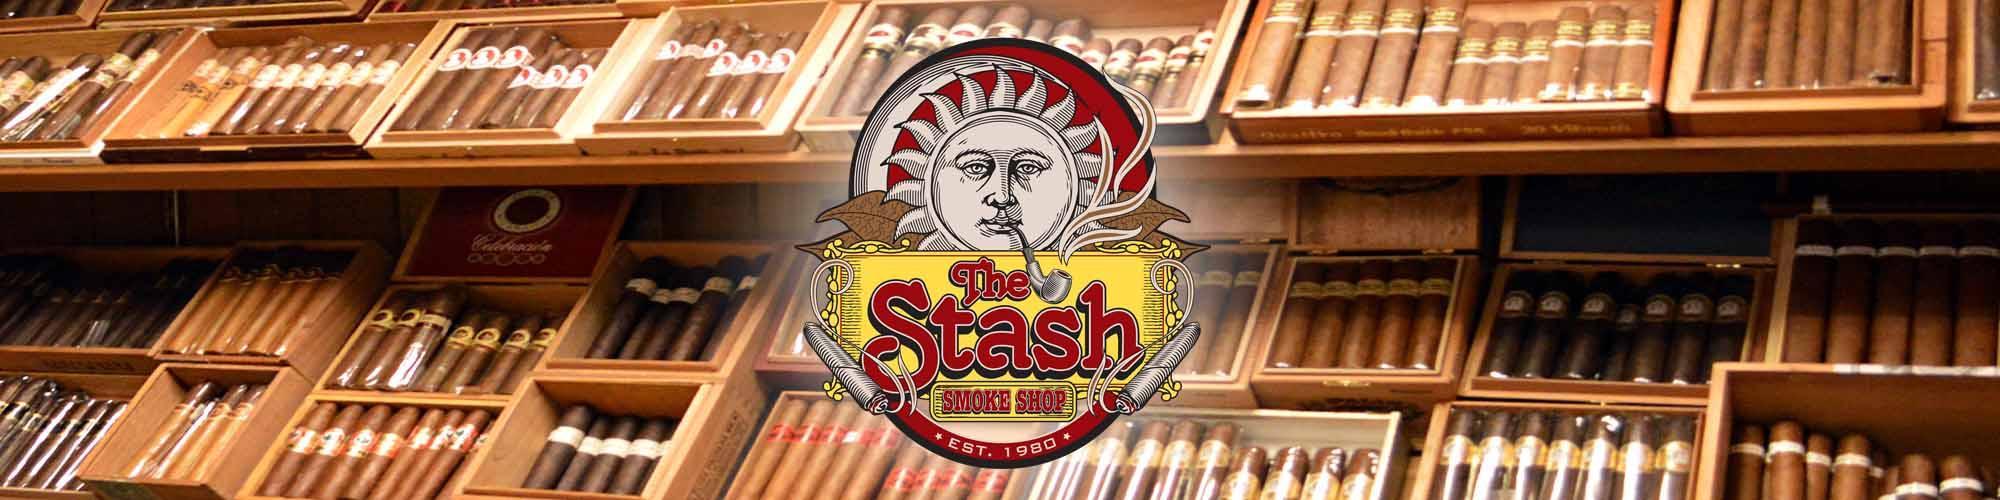 The-Stash-Slide-2